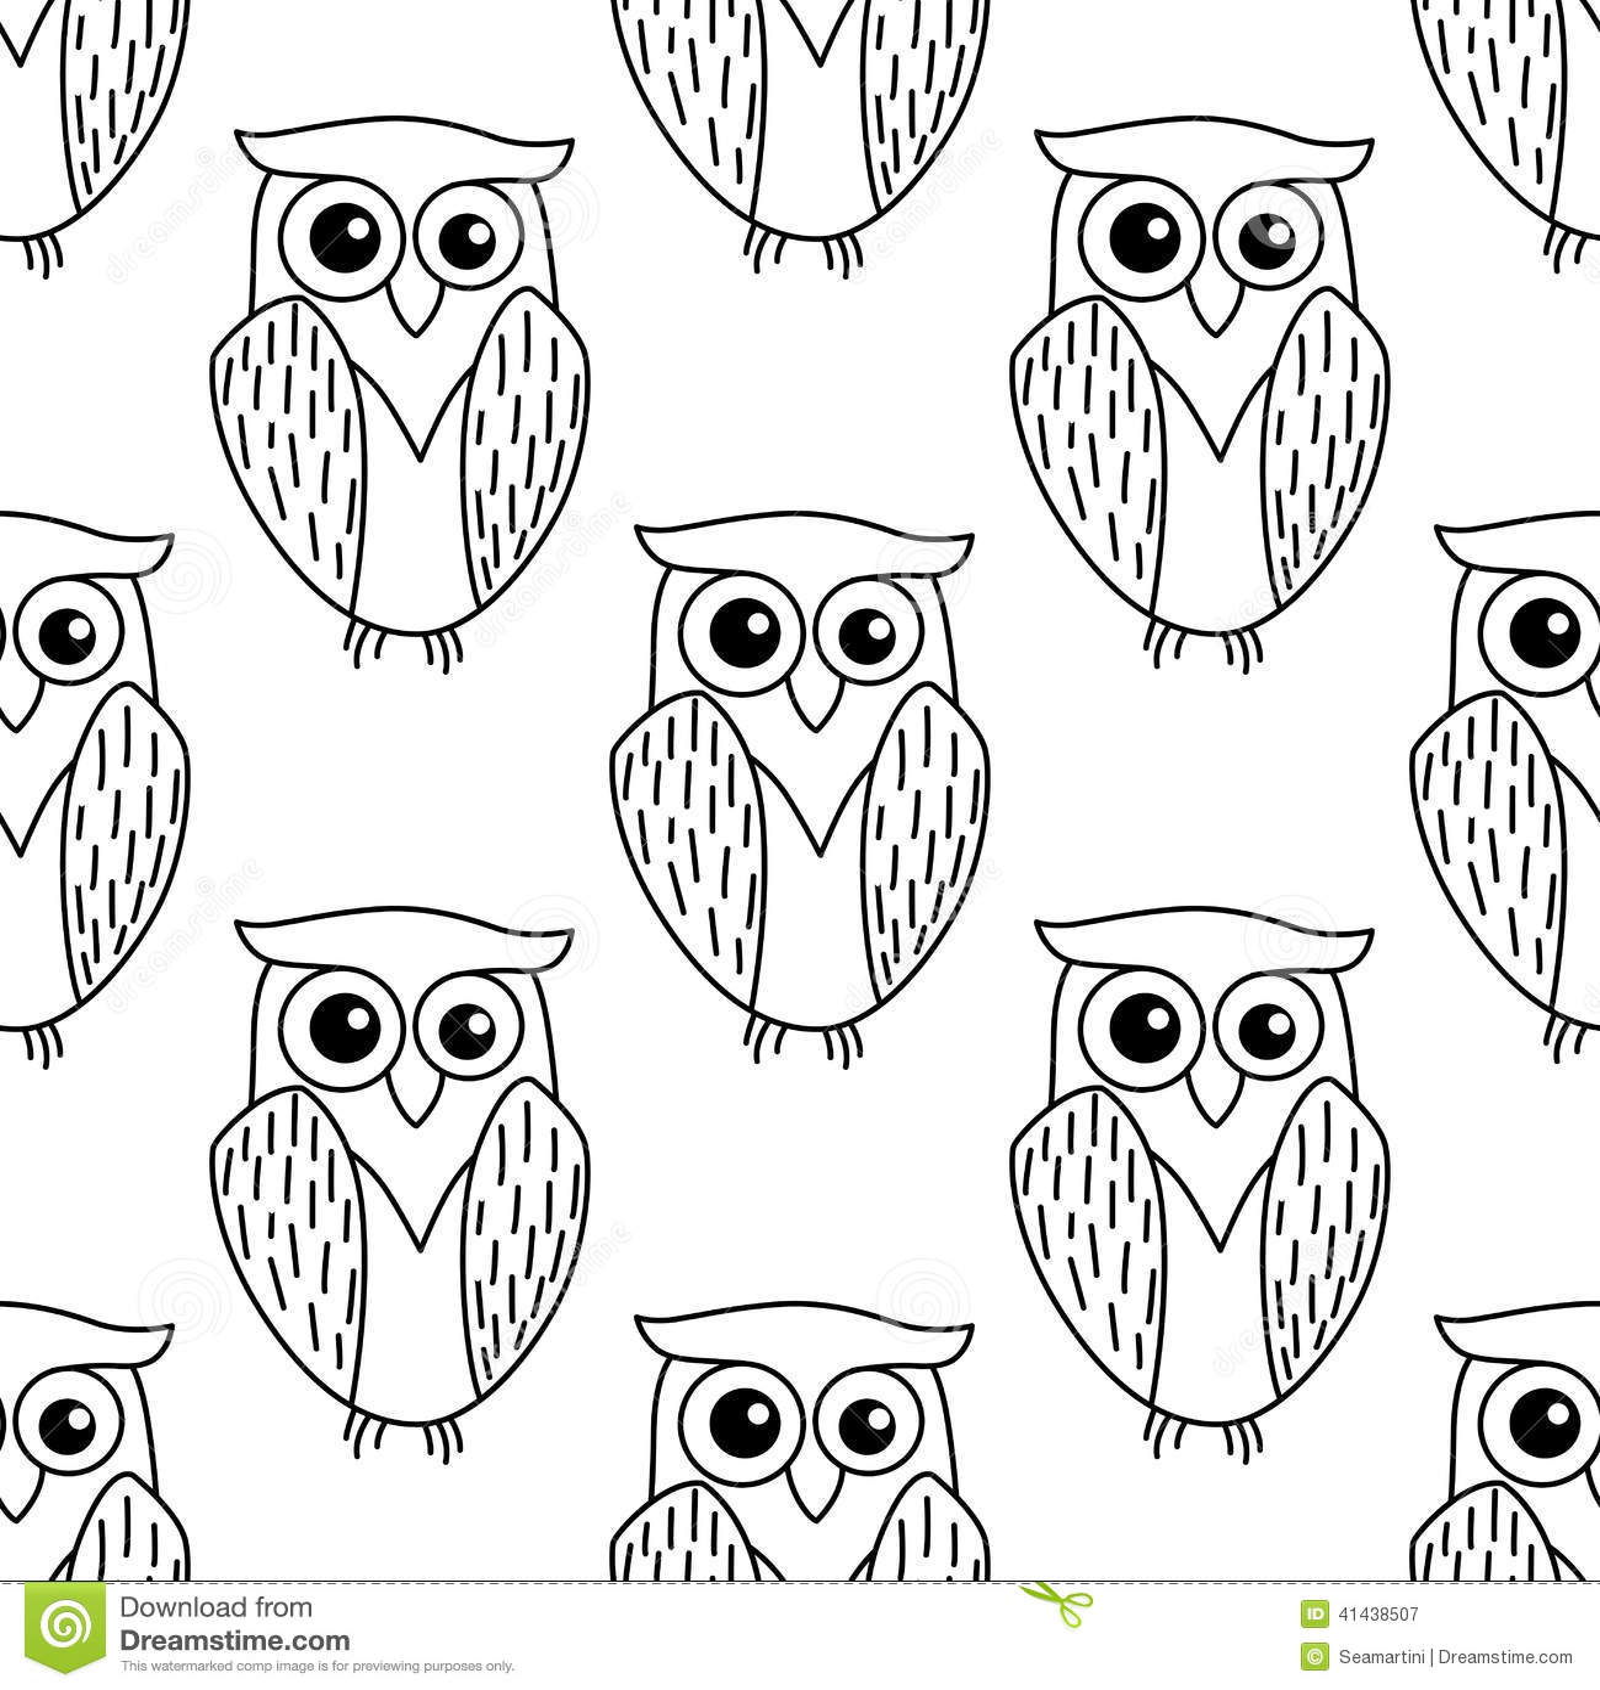 Cute Little Owl Seamless Pattern Stock Vector